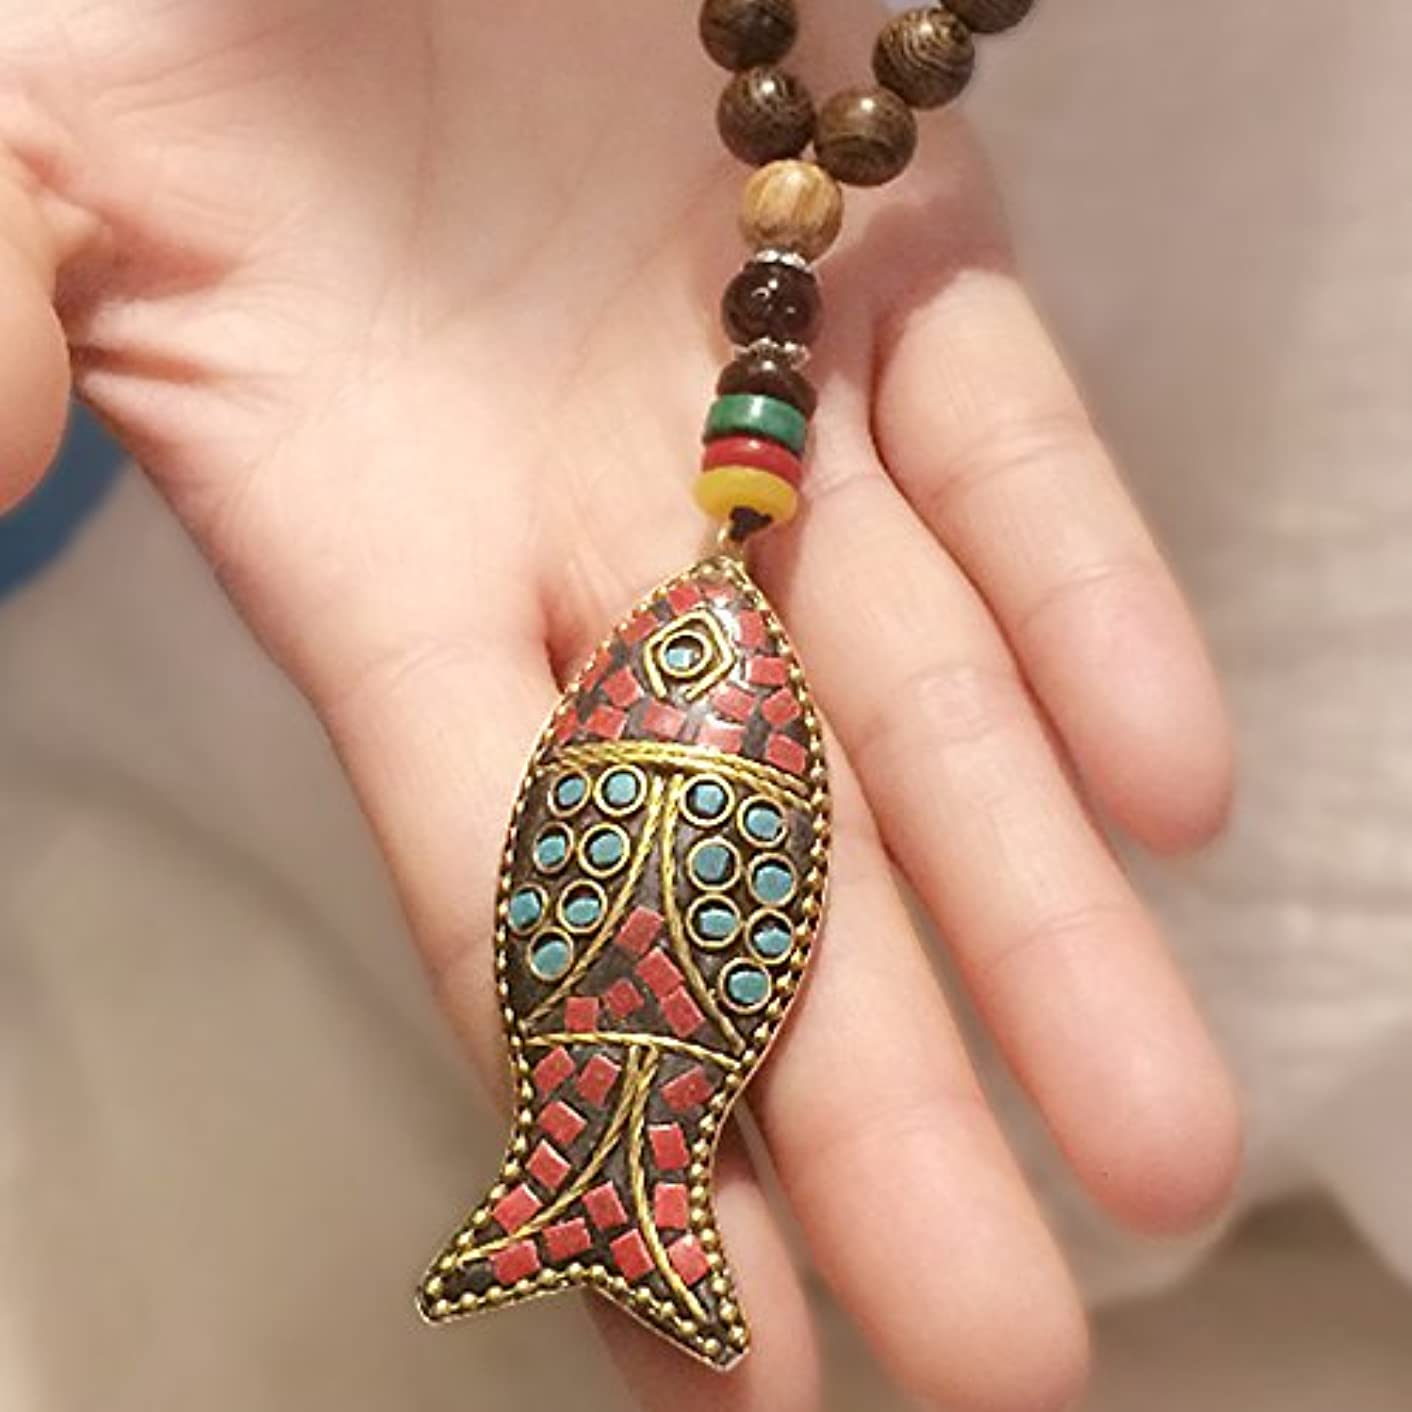 Generic national _Wind_ Retro autumn _Nepal_ jewelry _horn_ necklace Pendant s_ necklace Pendant _wooden_fish_ beads sweater chain necklace Pendant long _section men women rmivopyb83187272